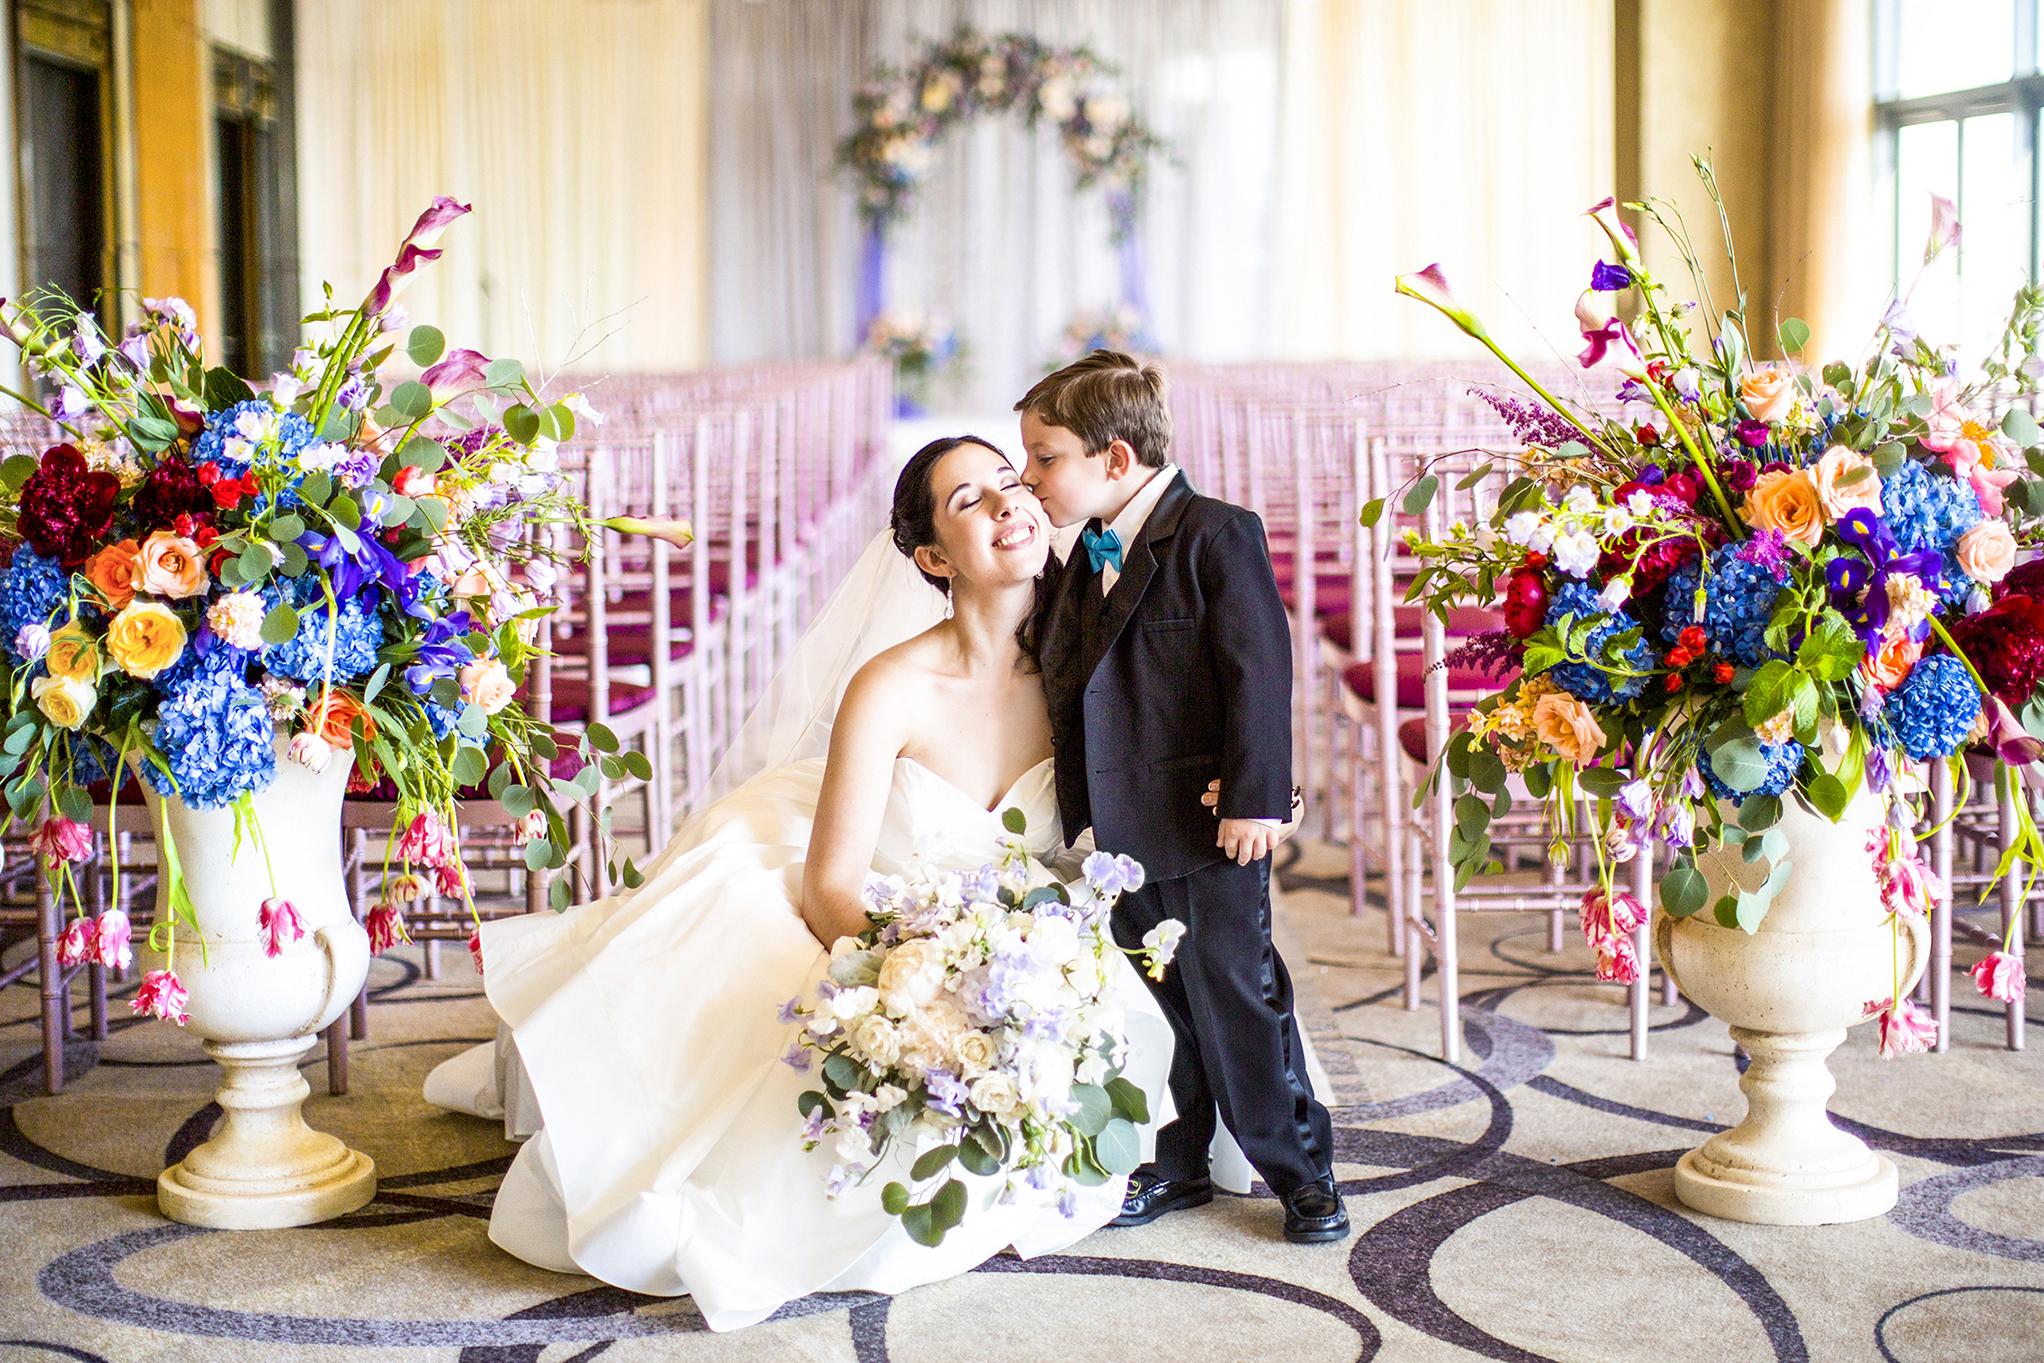 little-boy-kisses-brides-cheek-in-aisle-photo-by-anna-schmidt-photography